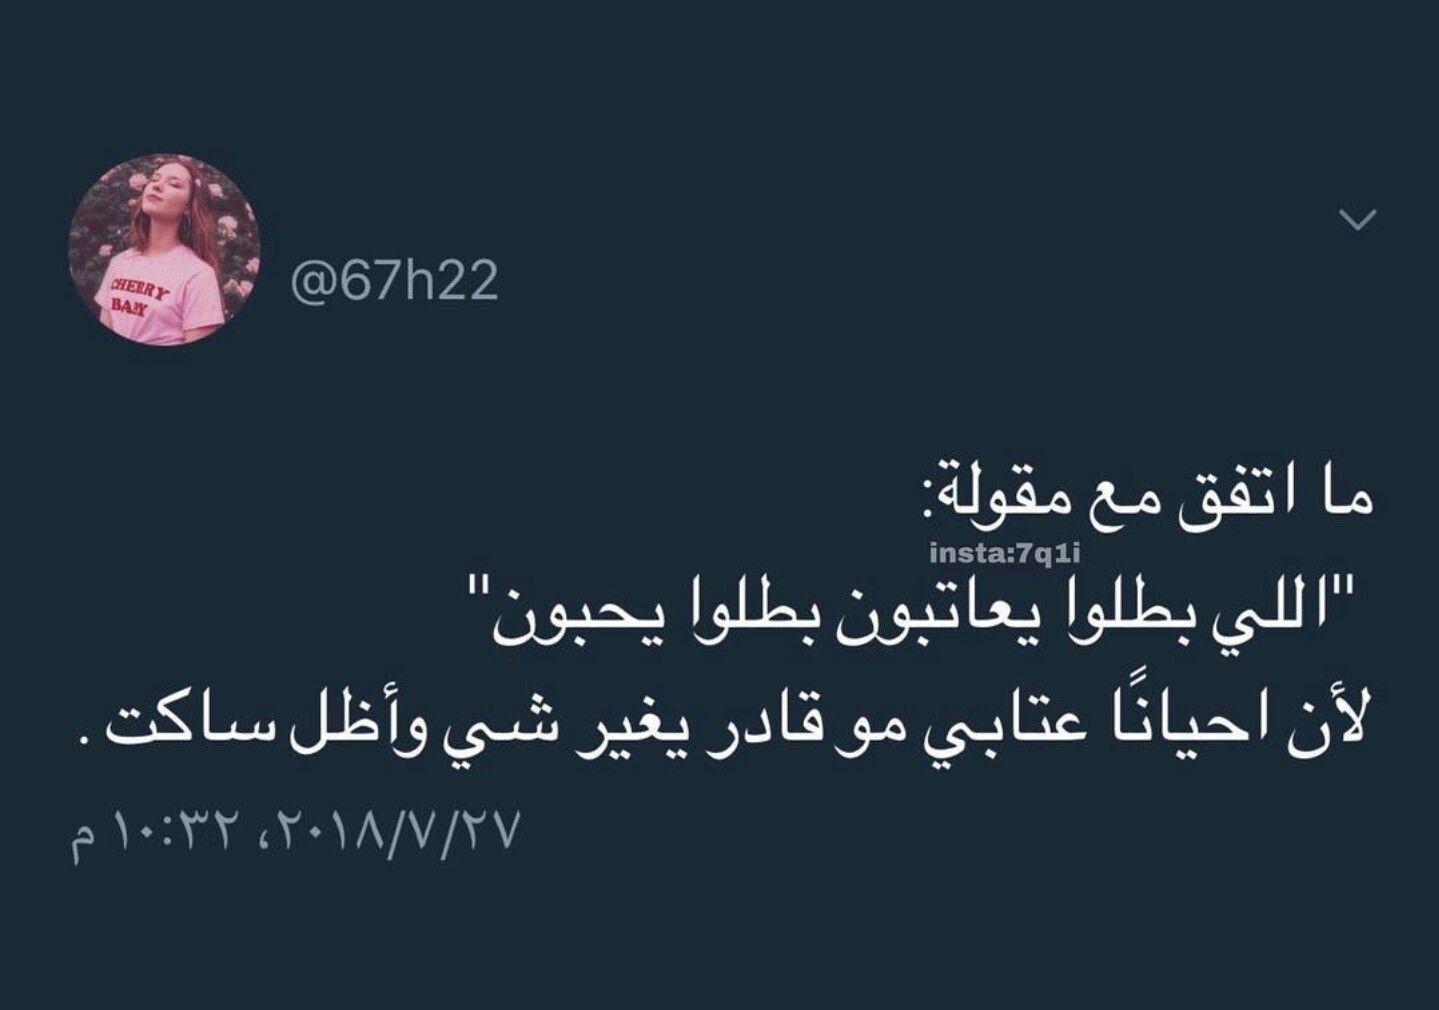 اكثر كلام واقعي حتى الان عن الحب والعتاب Mood Quotes Arabic Quotes Quotations